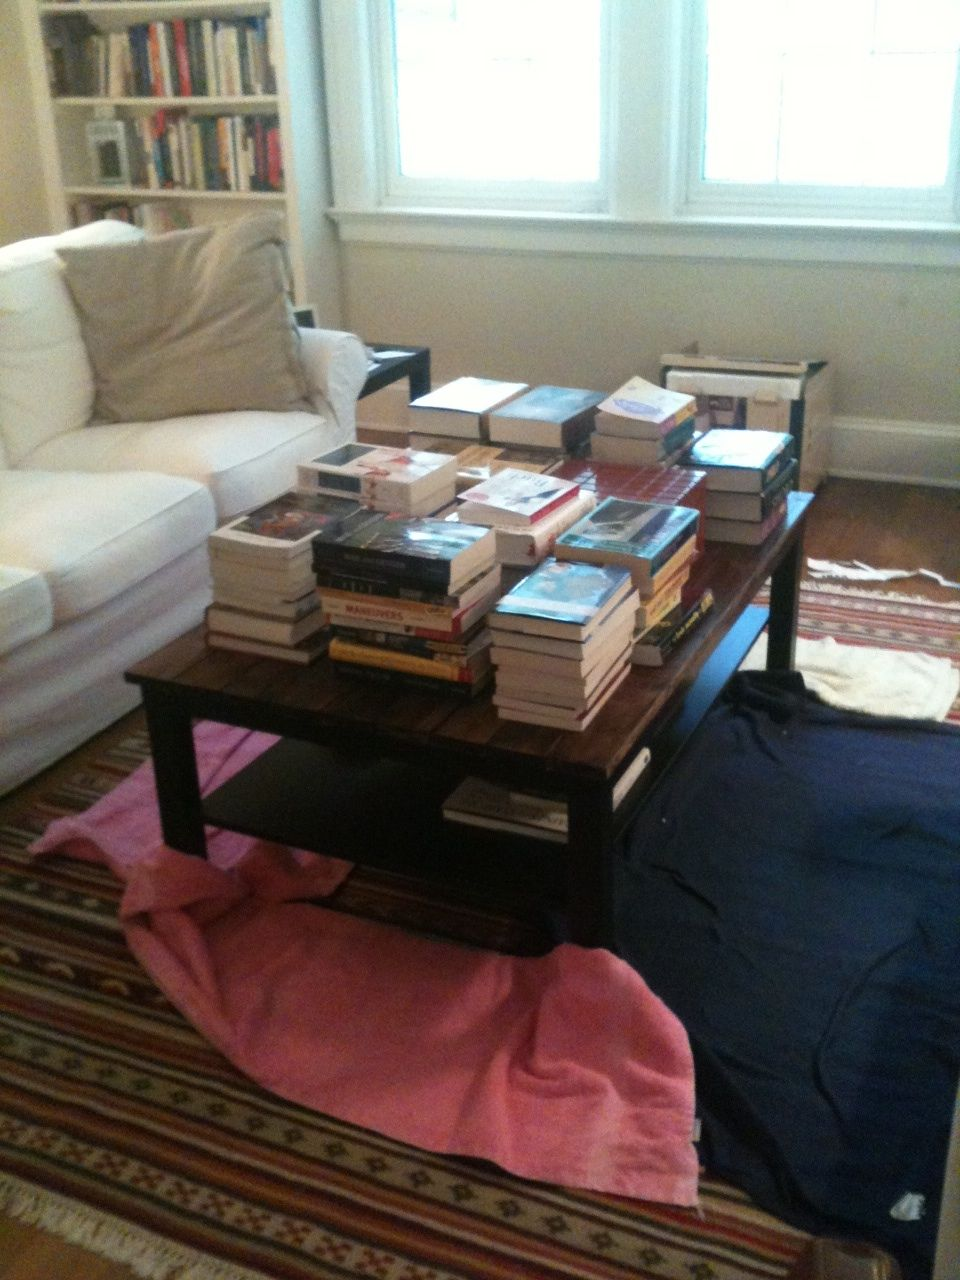 Diy rustic wood table - The Feminist Mystique Diy Rustic Wood Coffee Table Farm Table